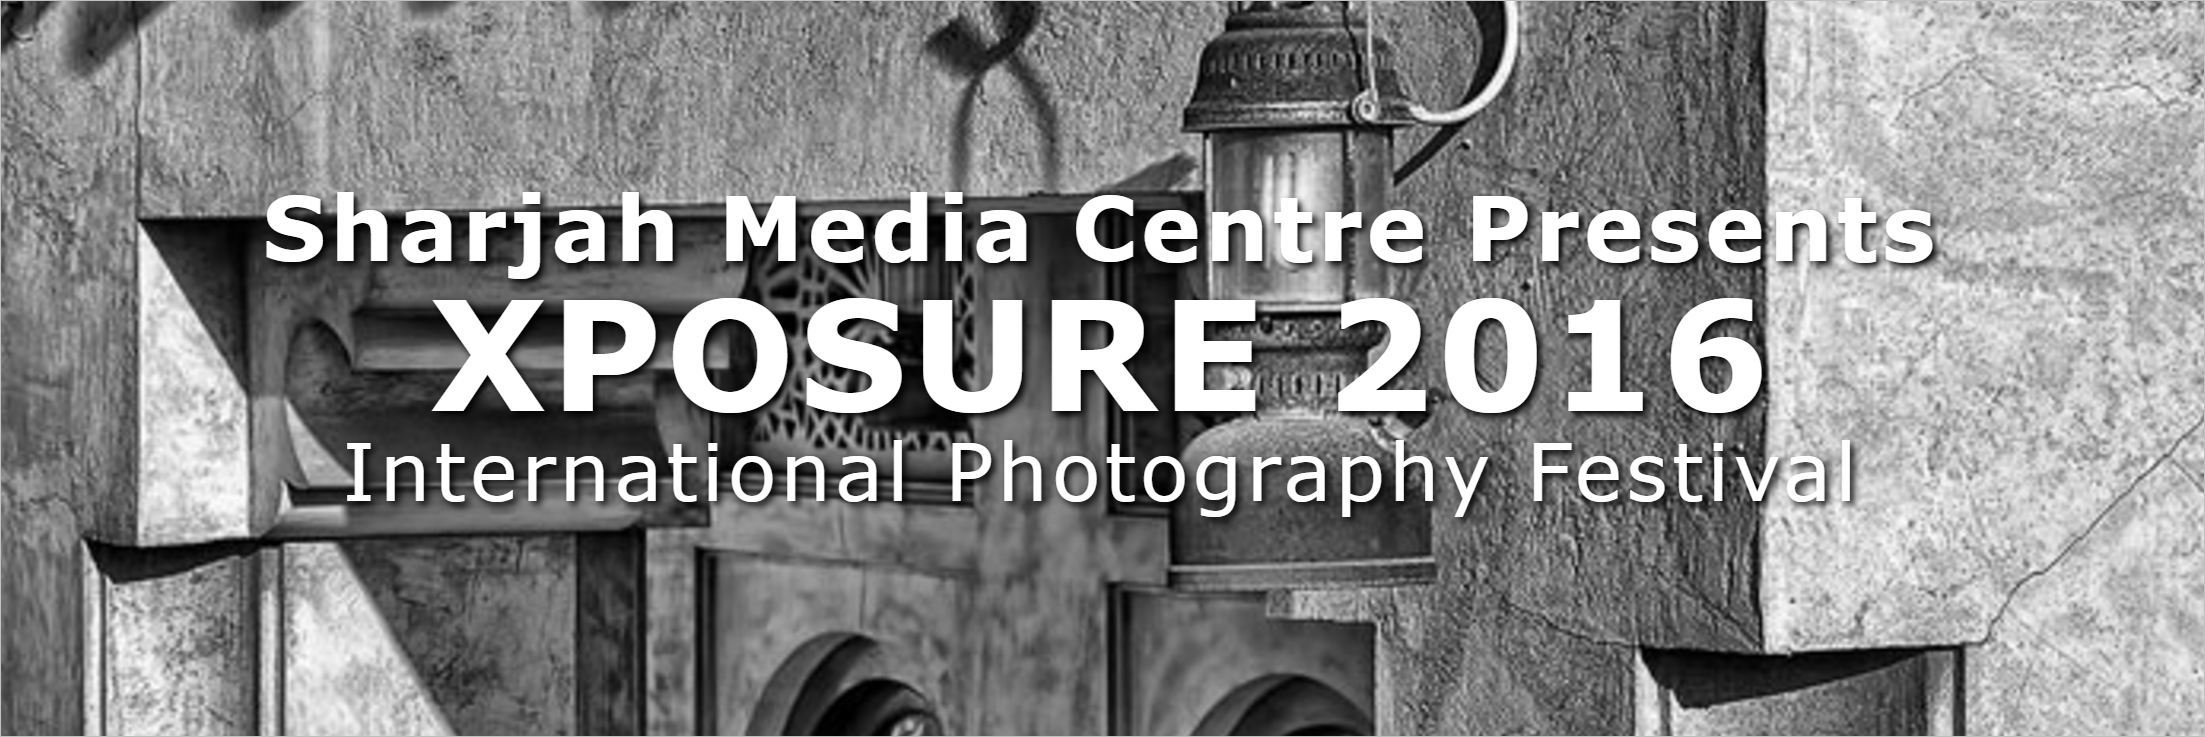 Xposure Photography Festival